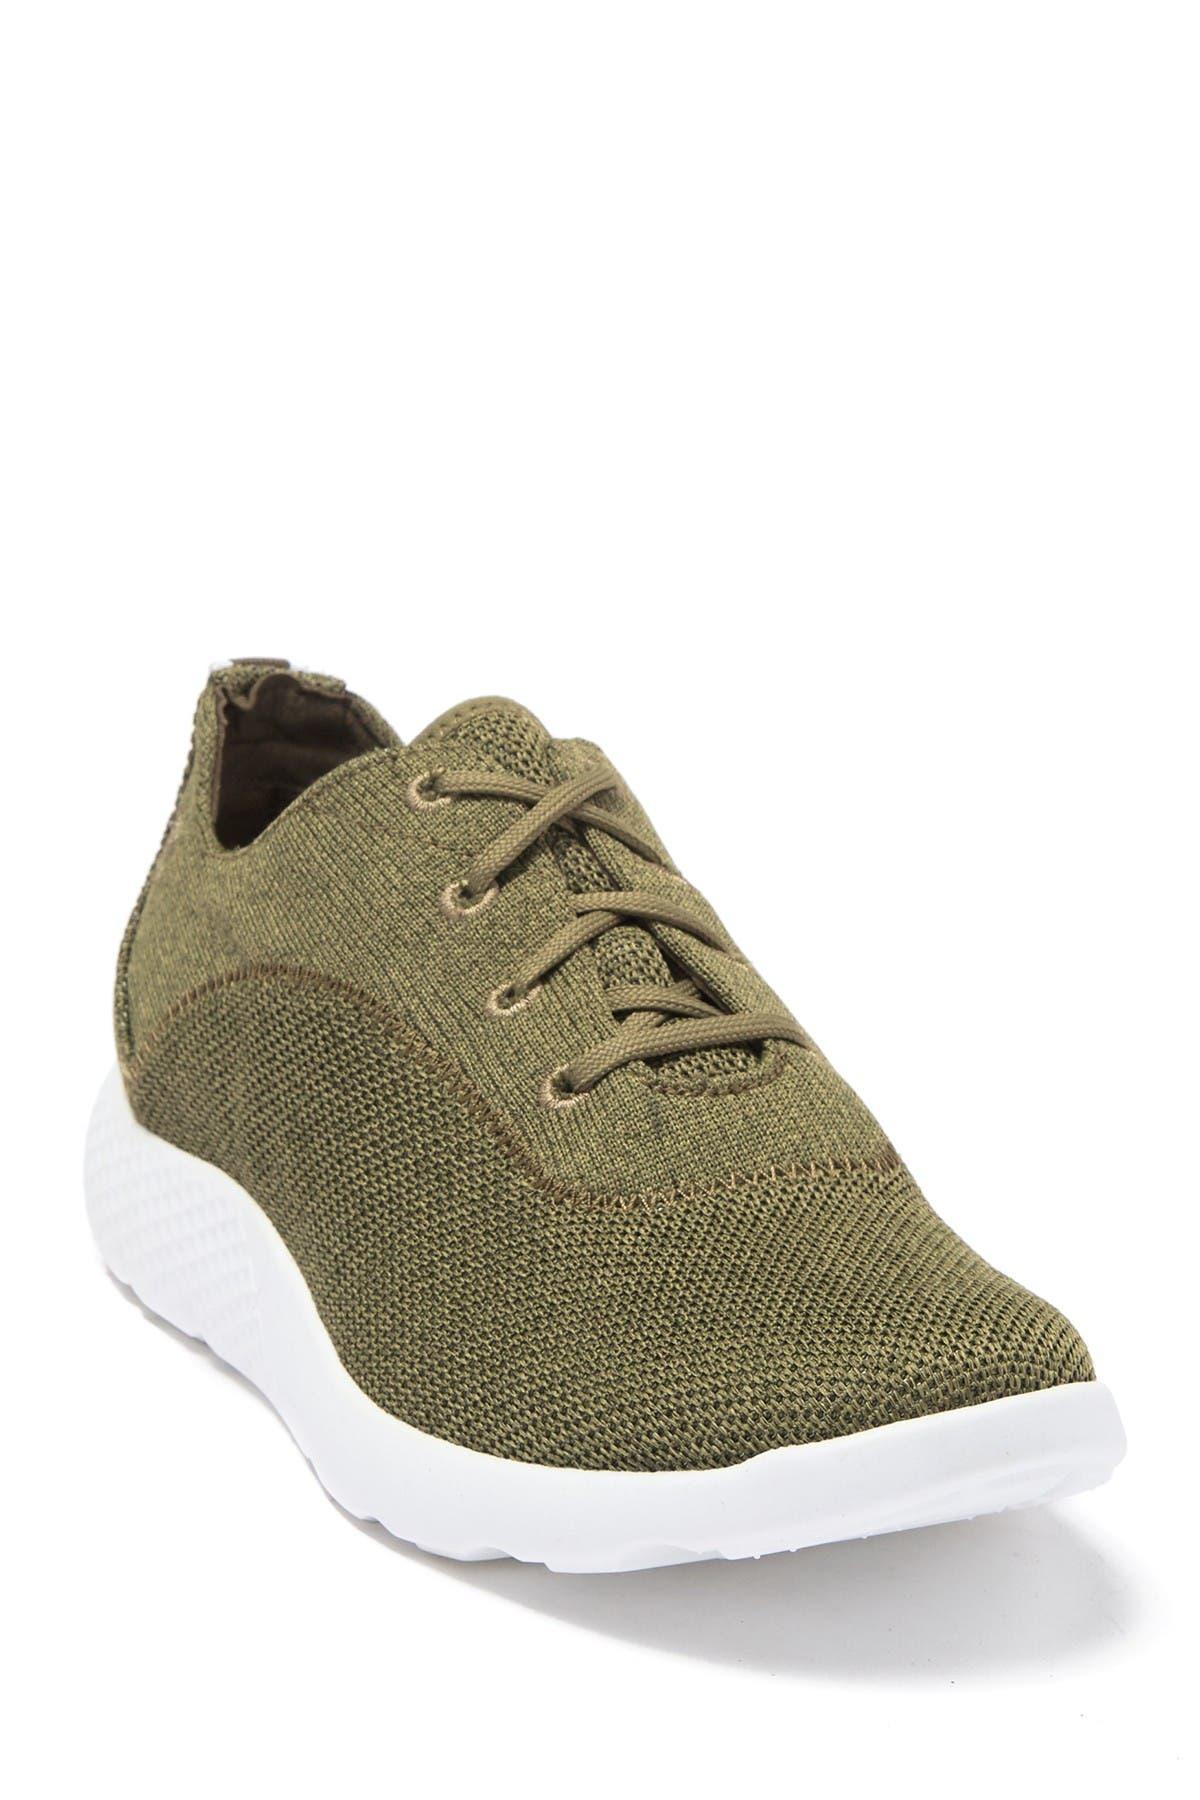 Image of Timberland Flyroam Flexknit Ox Sneaker